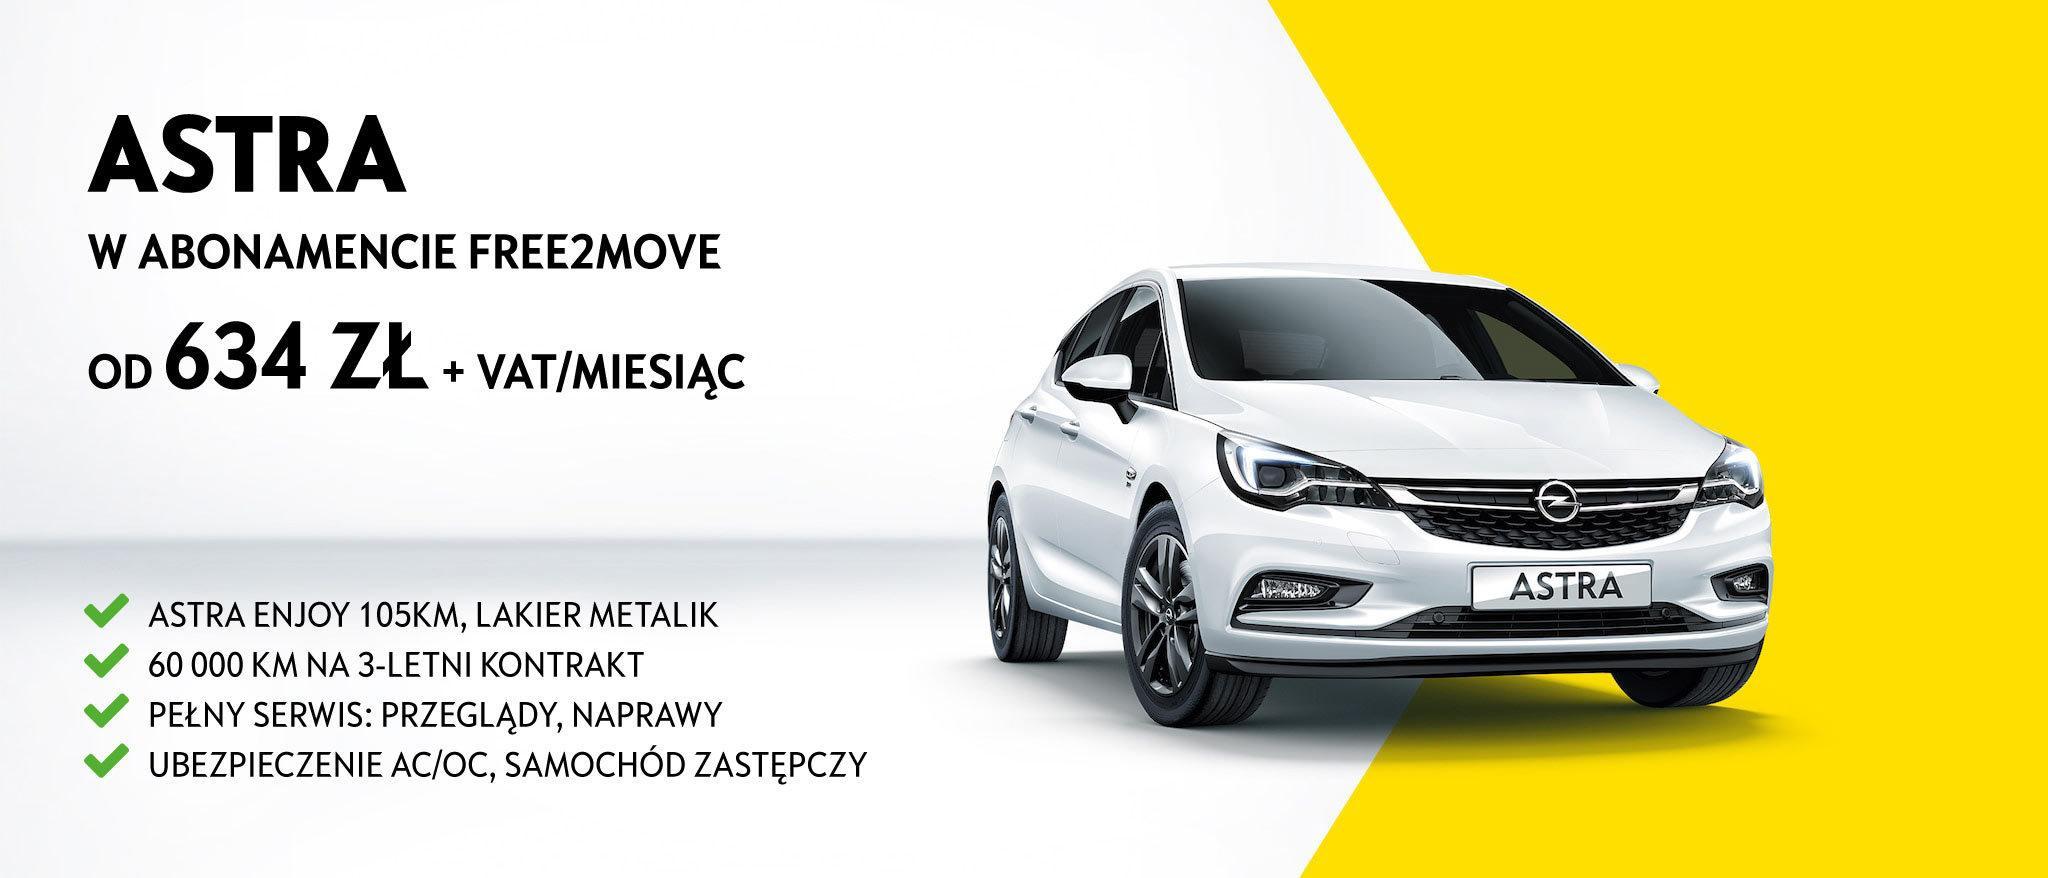 Opel Astra abonament